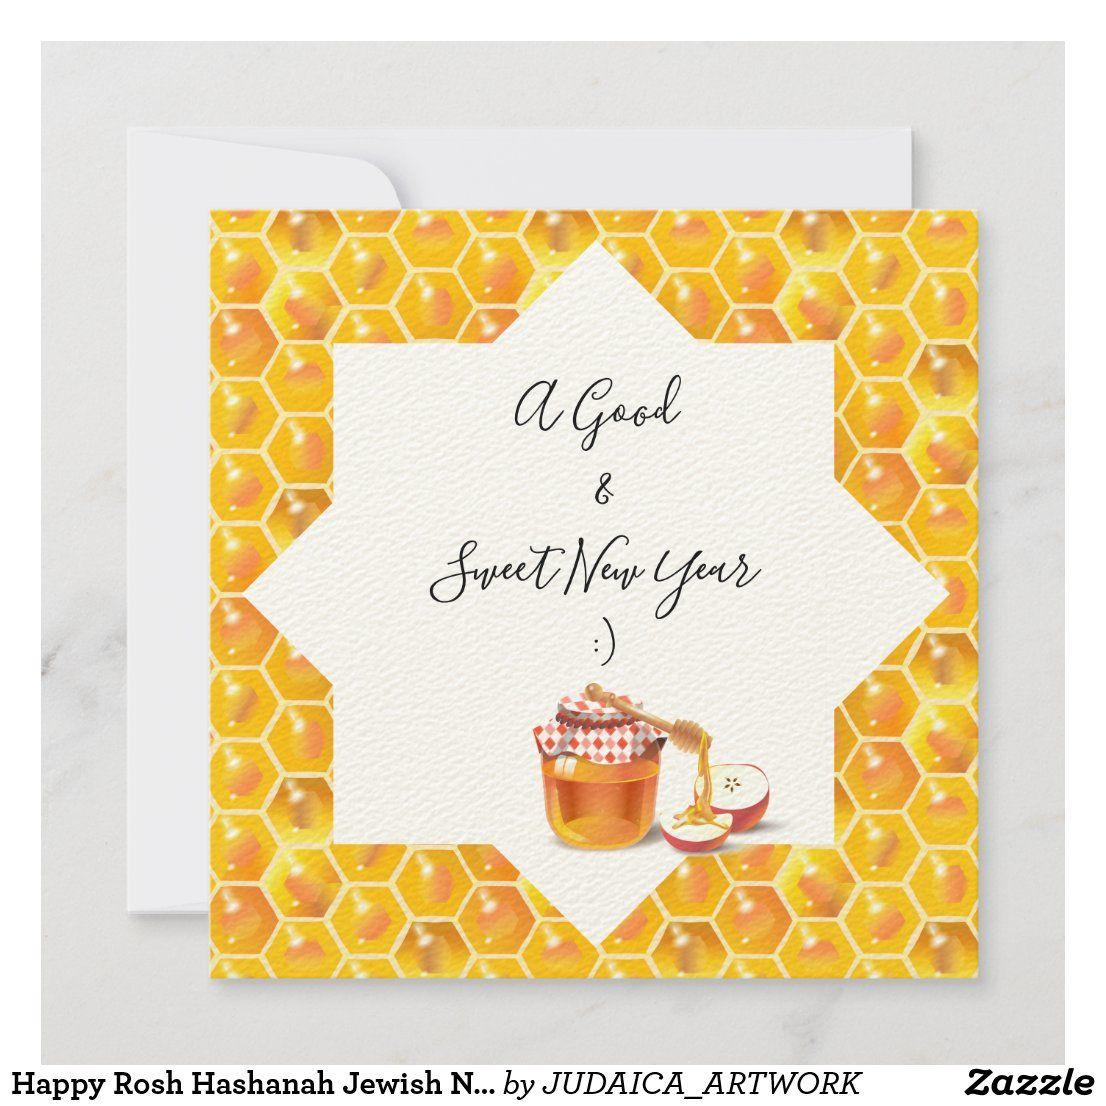 Happy Rosh Hashanah Jewish New Year Honey & Apple Thank